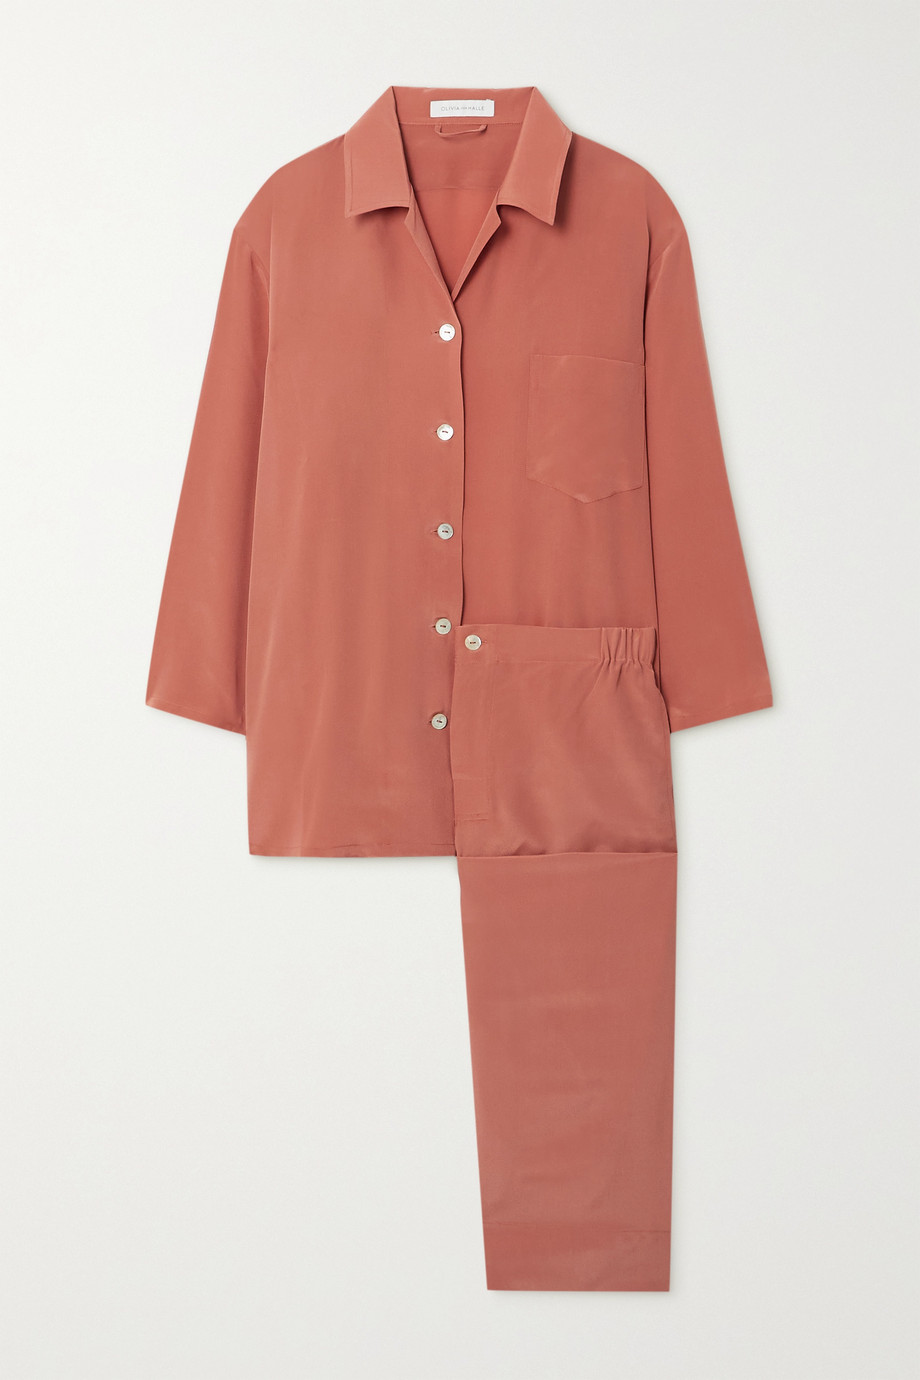 Olivia von Halle Casablanca silk crepe de chine pajama set